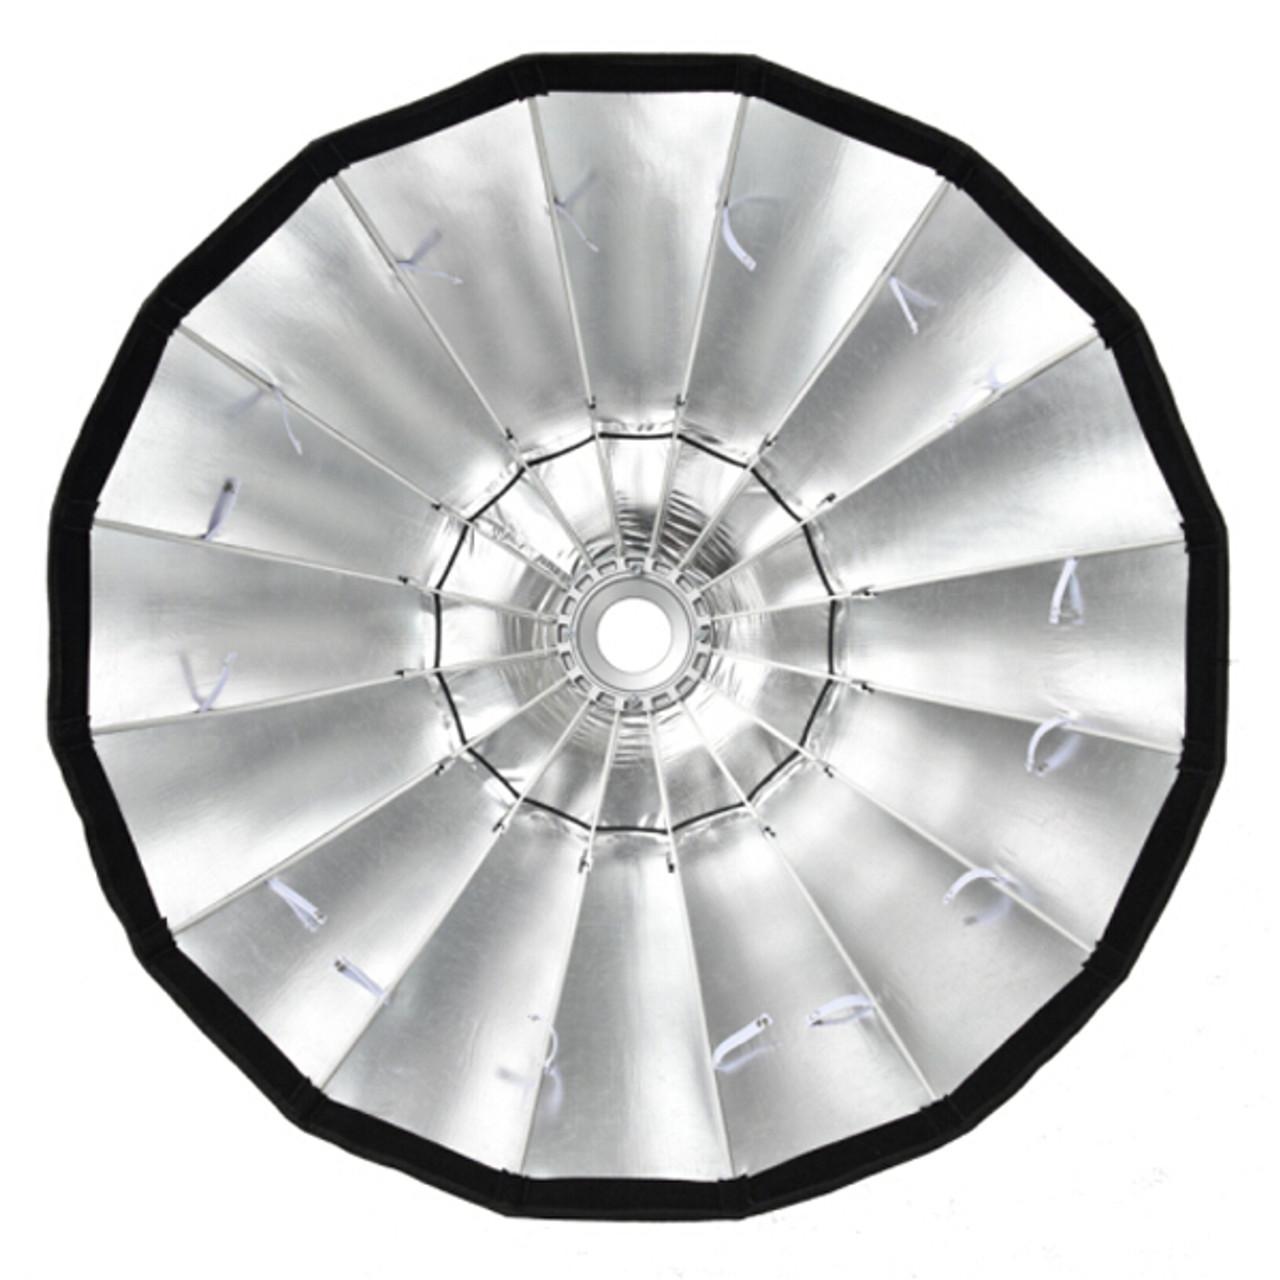 Godox Parabolic Softbox P90L (Bowens Mount)